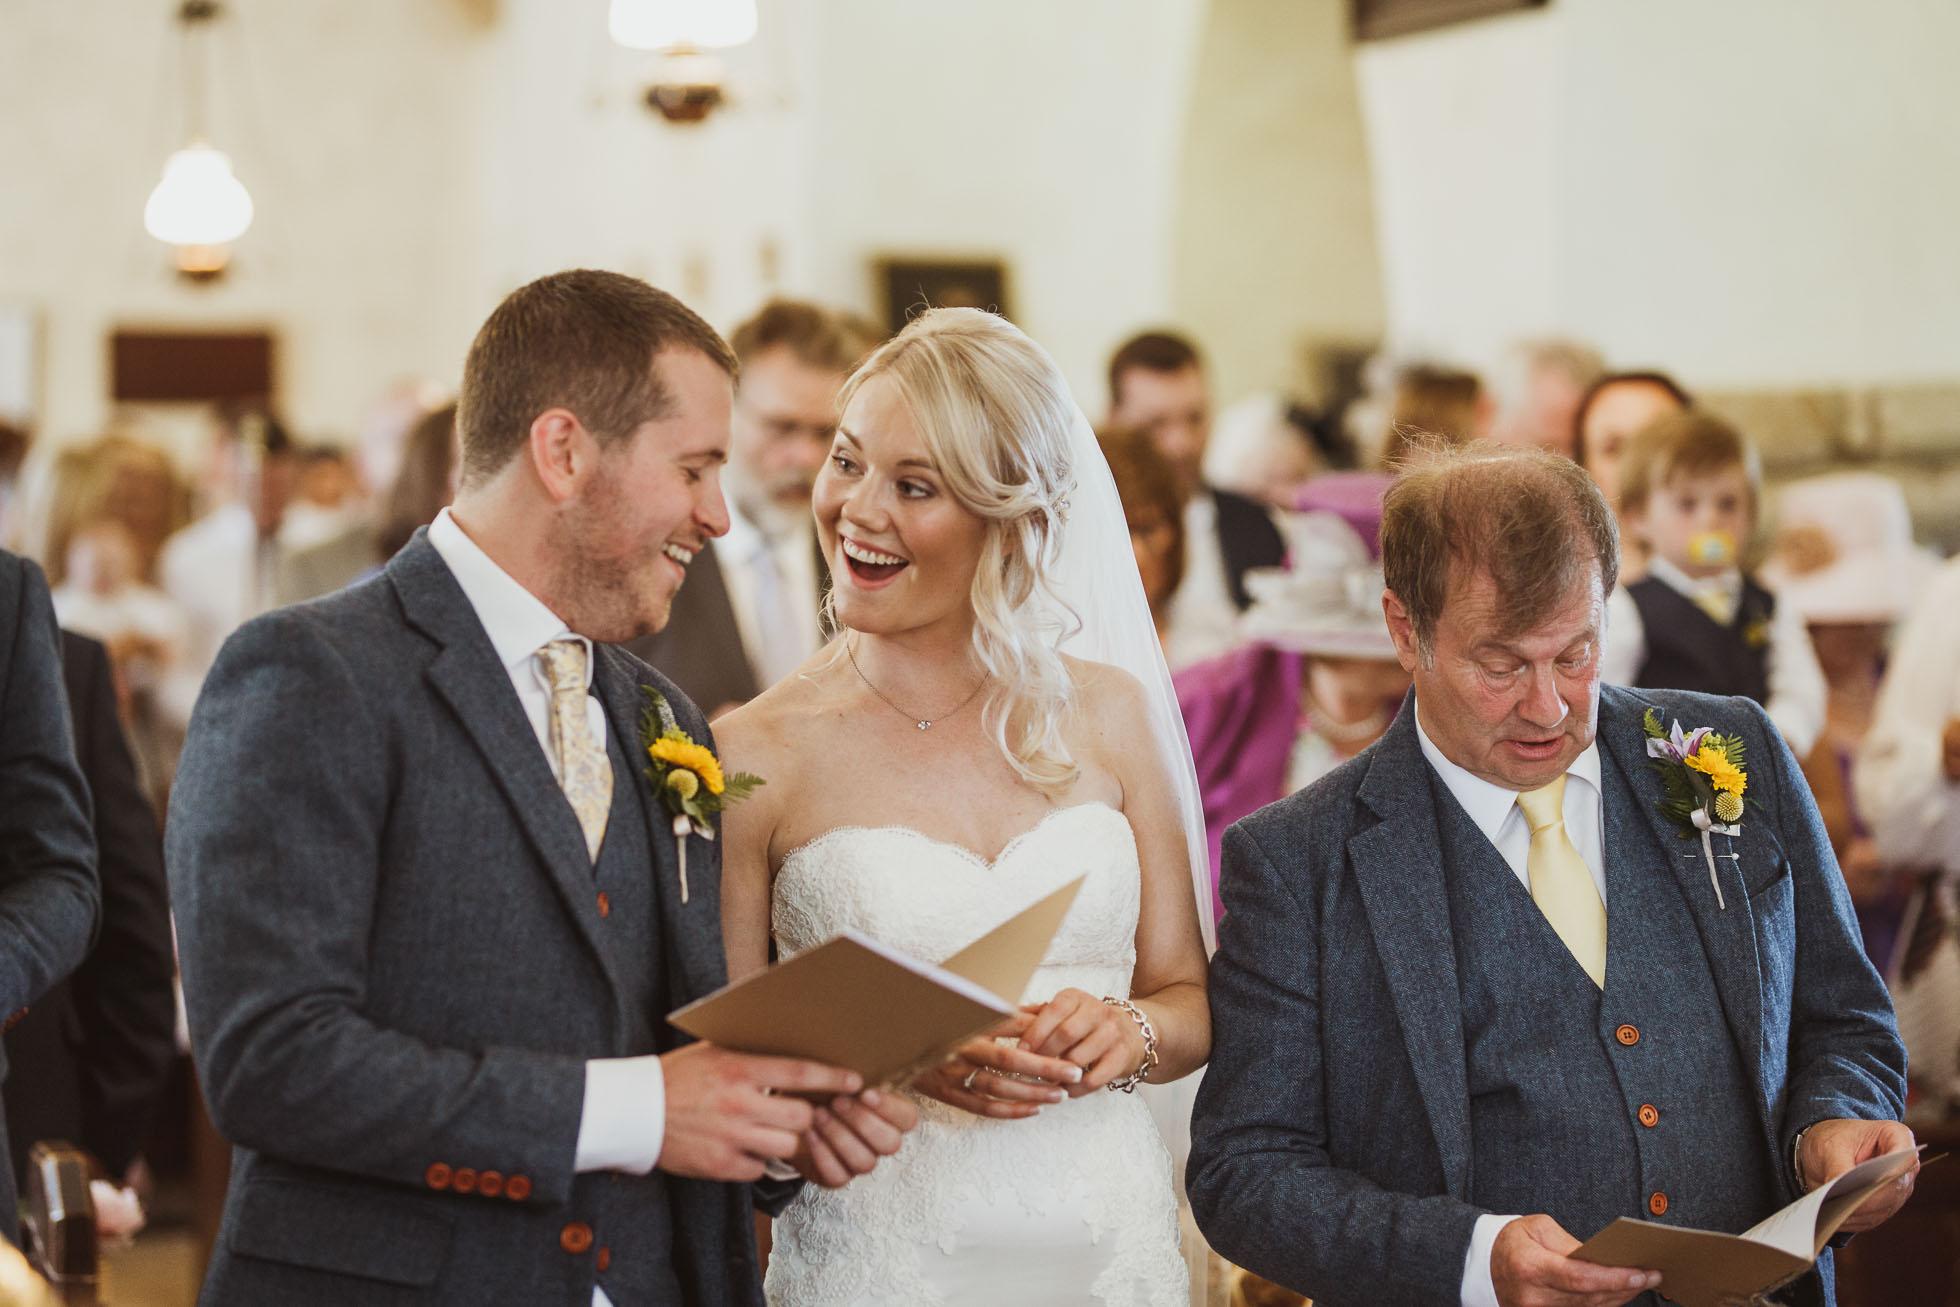 the_barn_scarborough_wedding_photographer-22.jpg